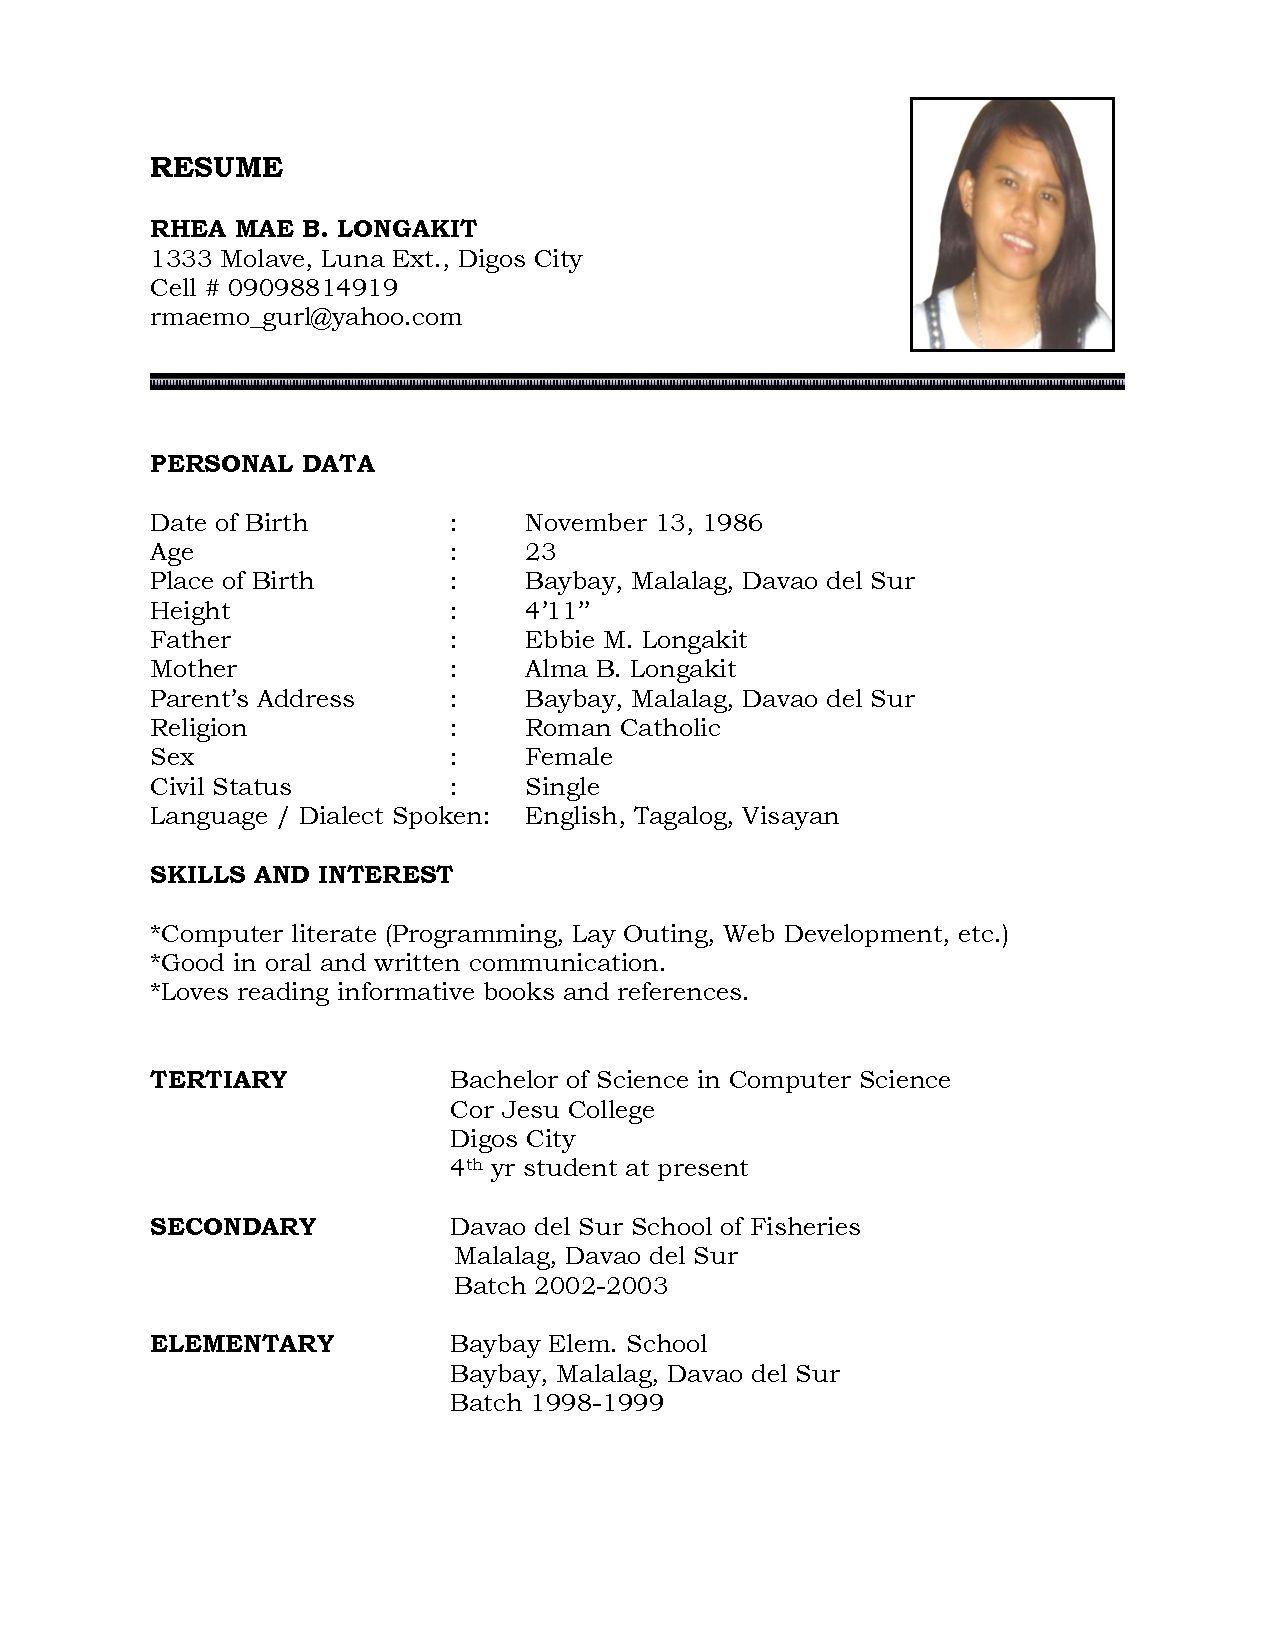 Resume Format Hd Images Download